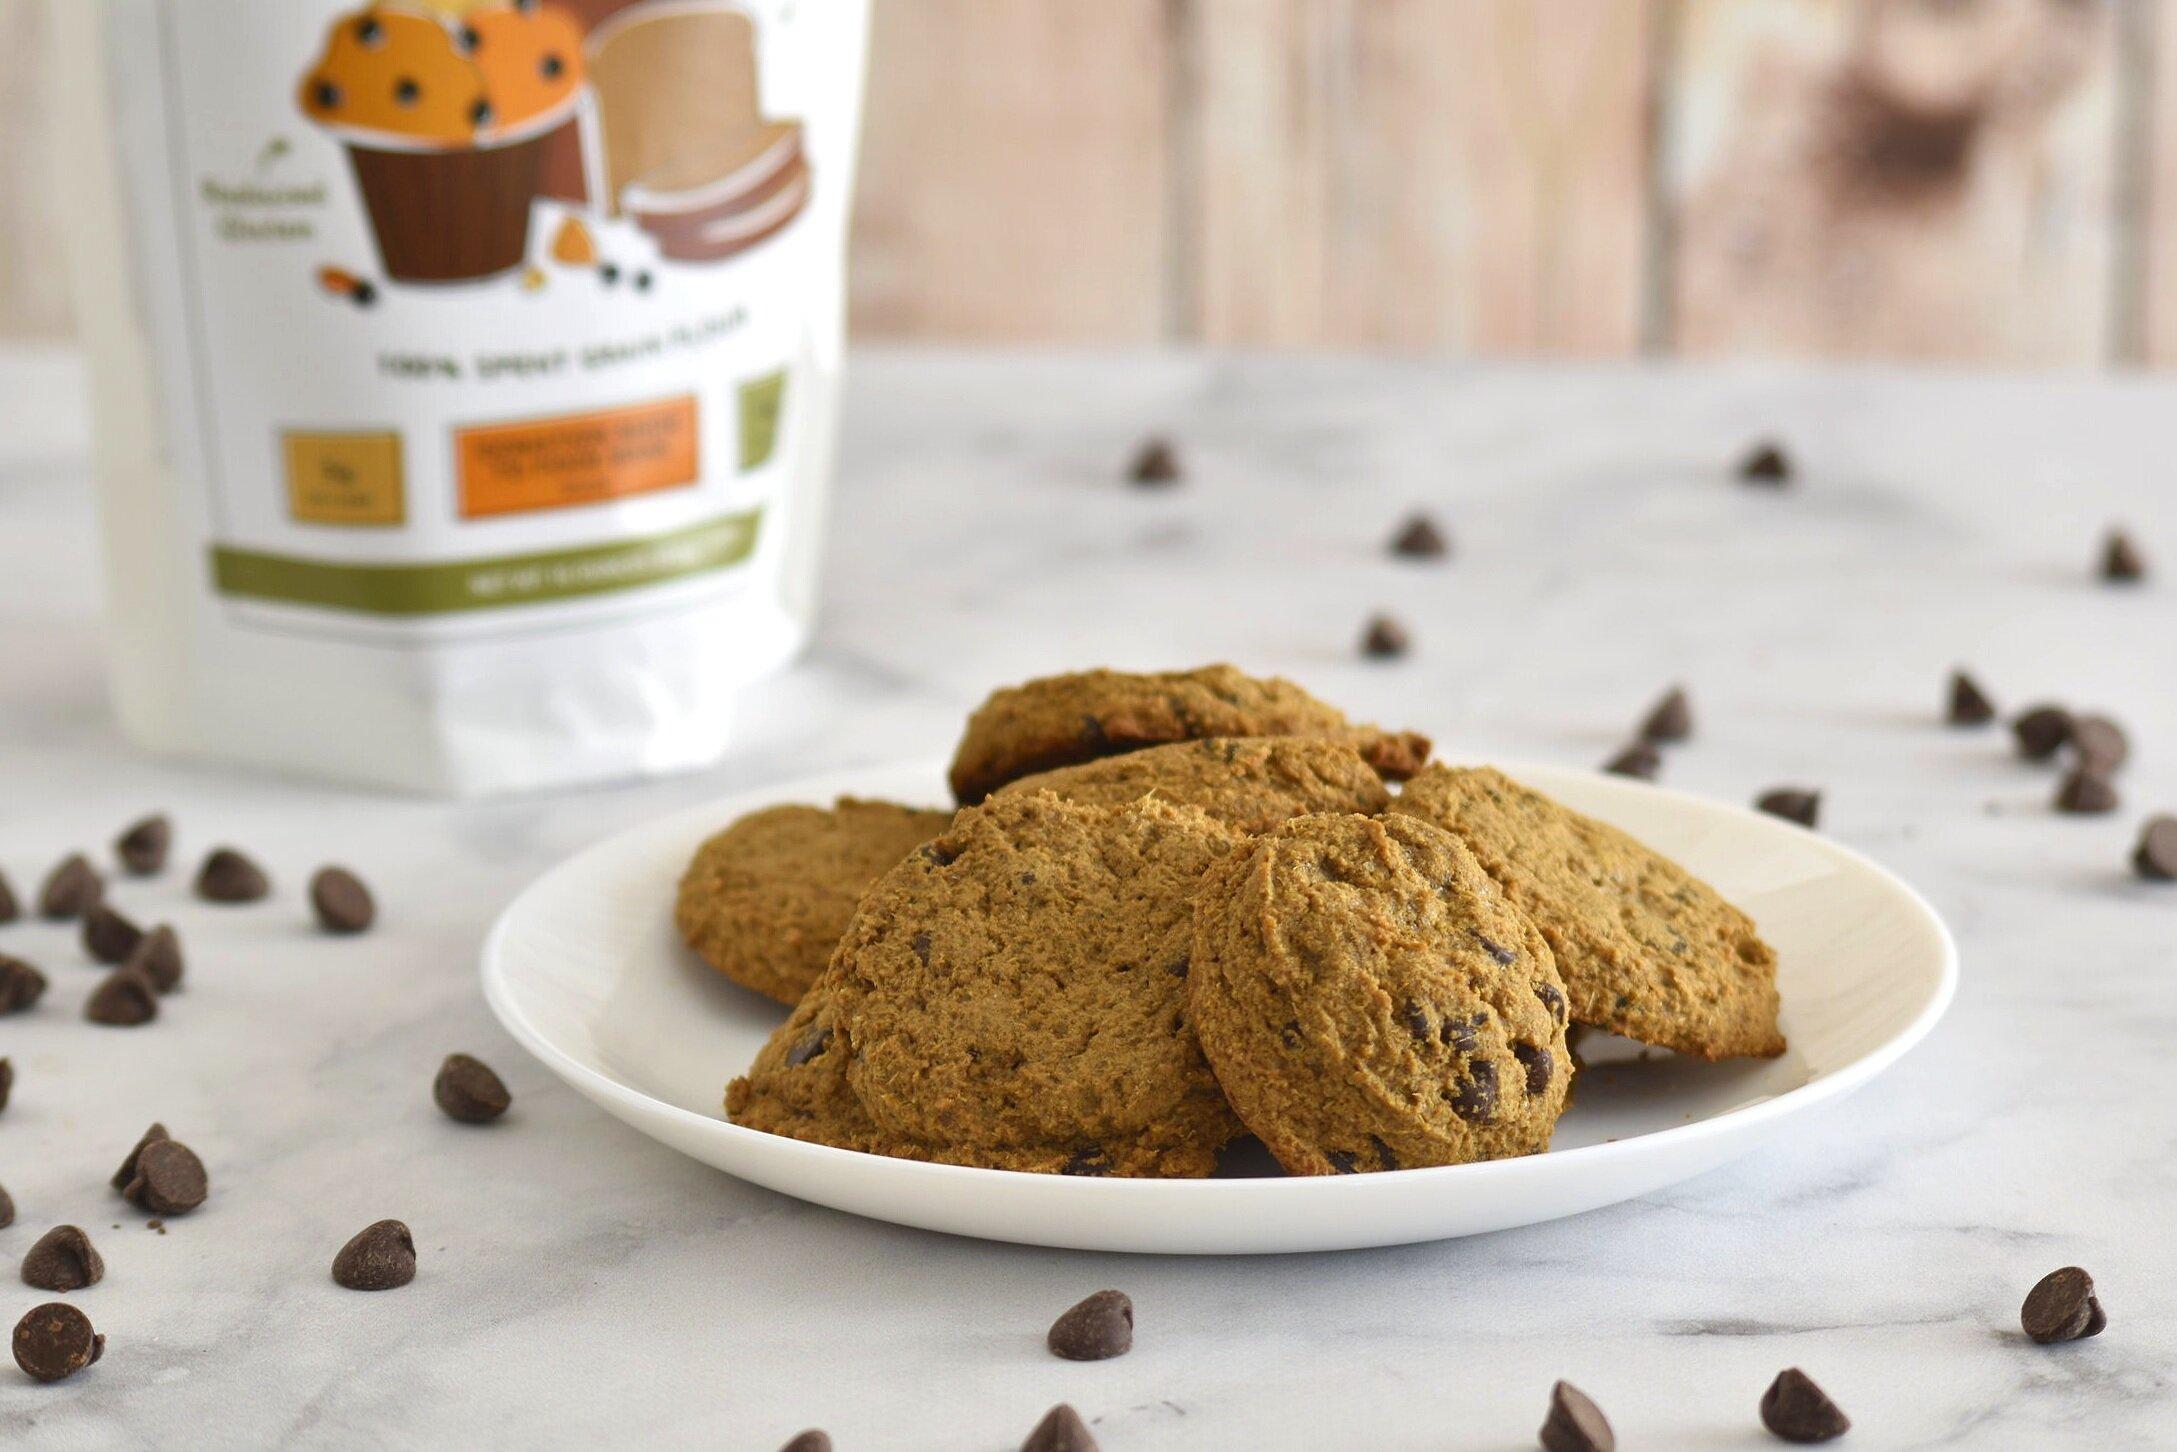 keto+chocolate+chip+cookies+page.jpg